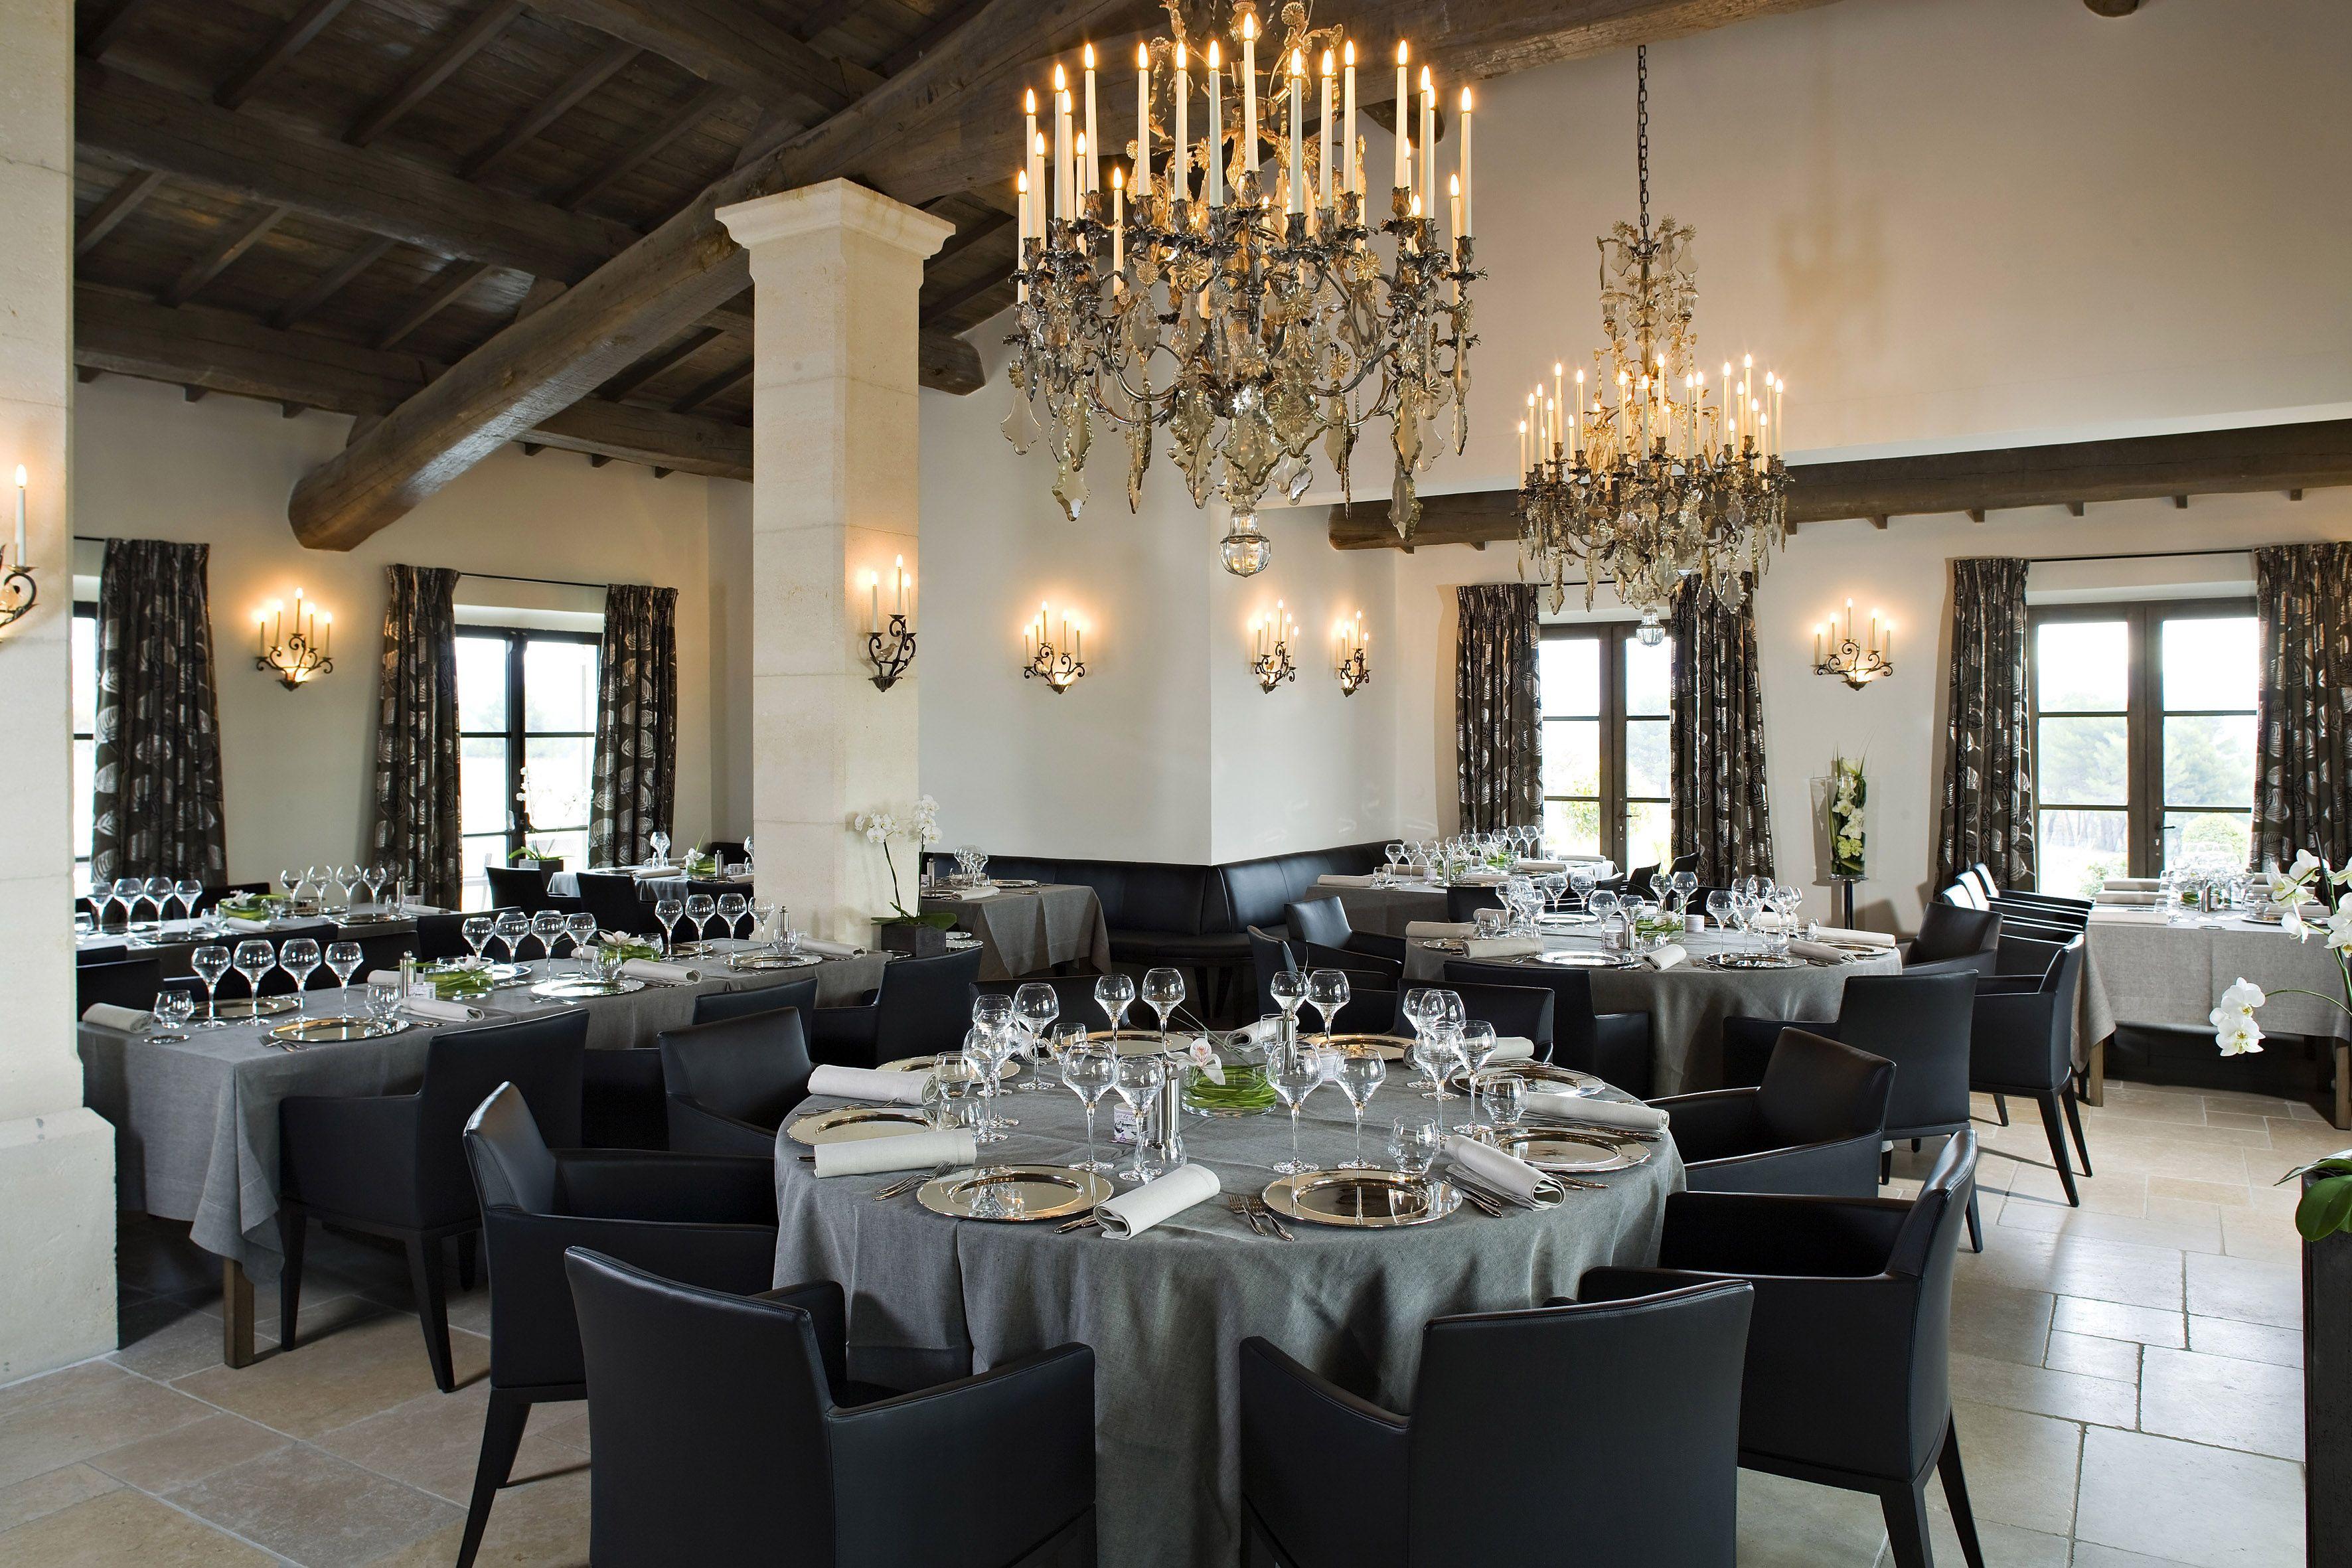 Salle du gourmet restaurant gastronomique 1 toile la - Restaurant gastronomique salon de provence ...